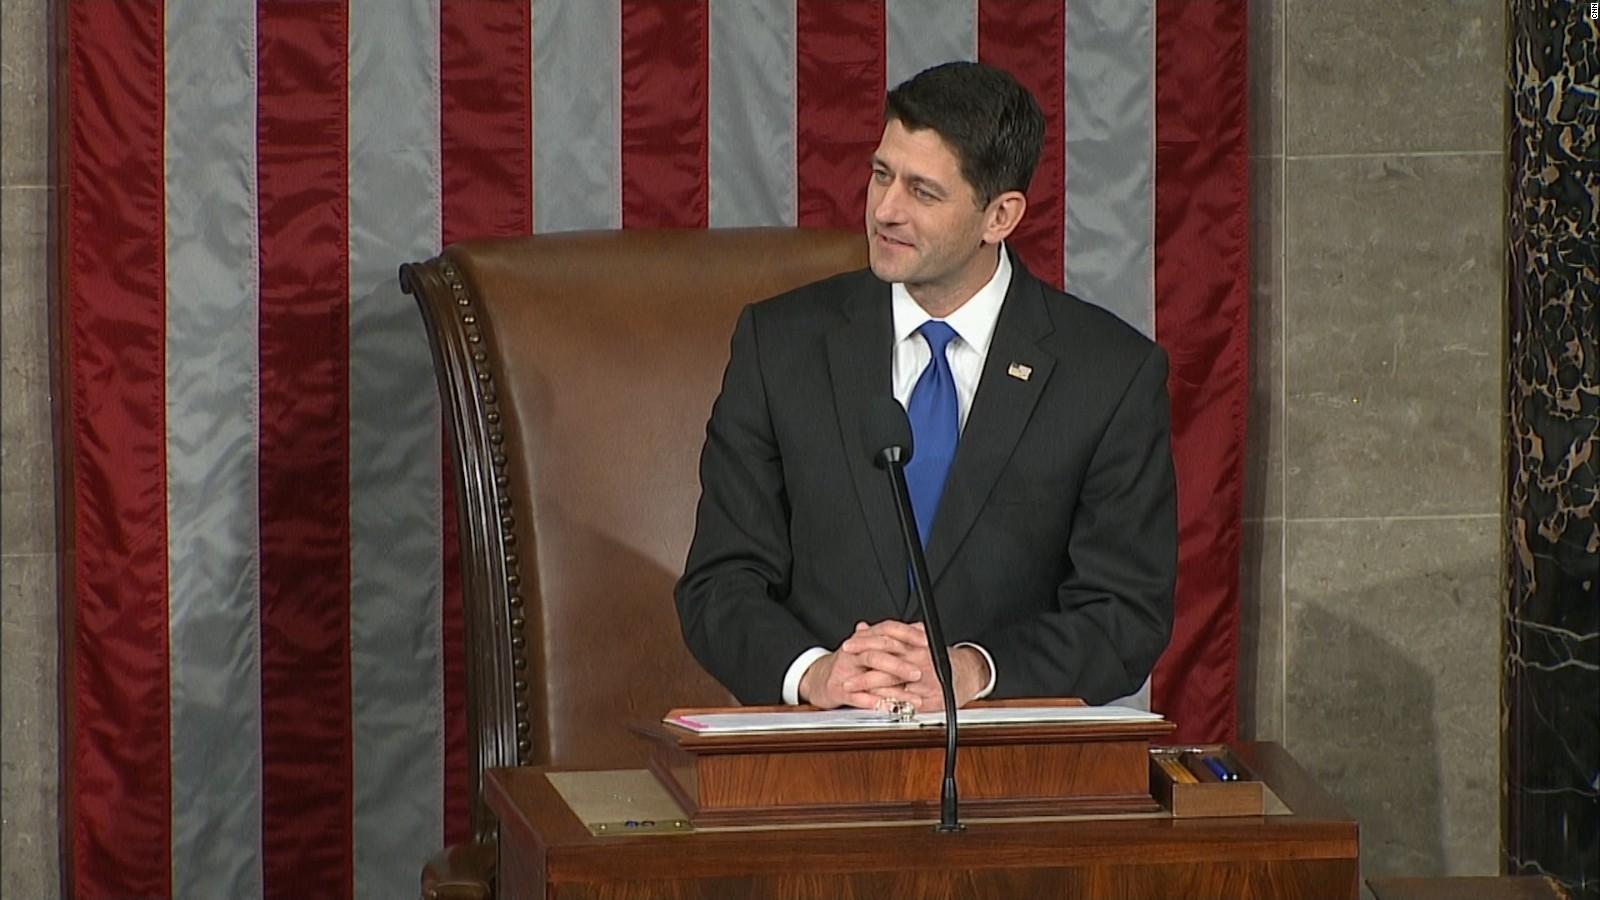 Paul Ryan Re Elected As House Speaker Tuesday   CNNPolitics